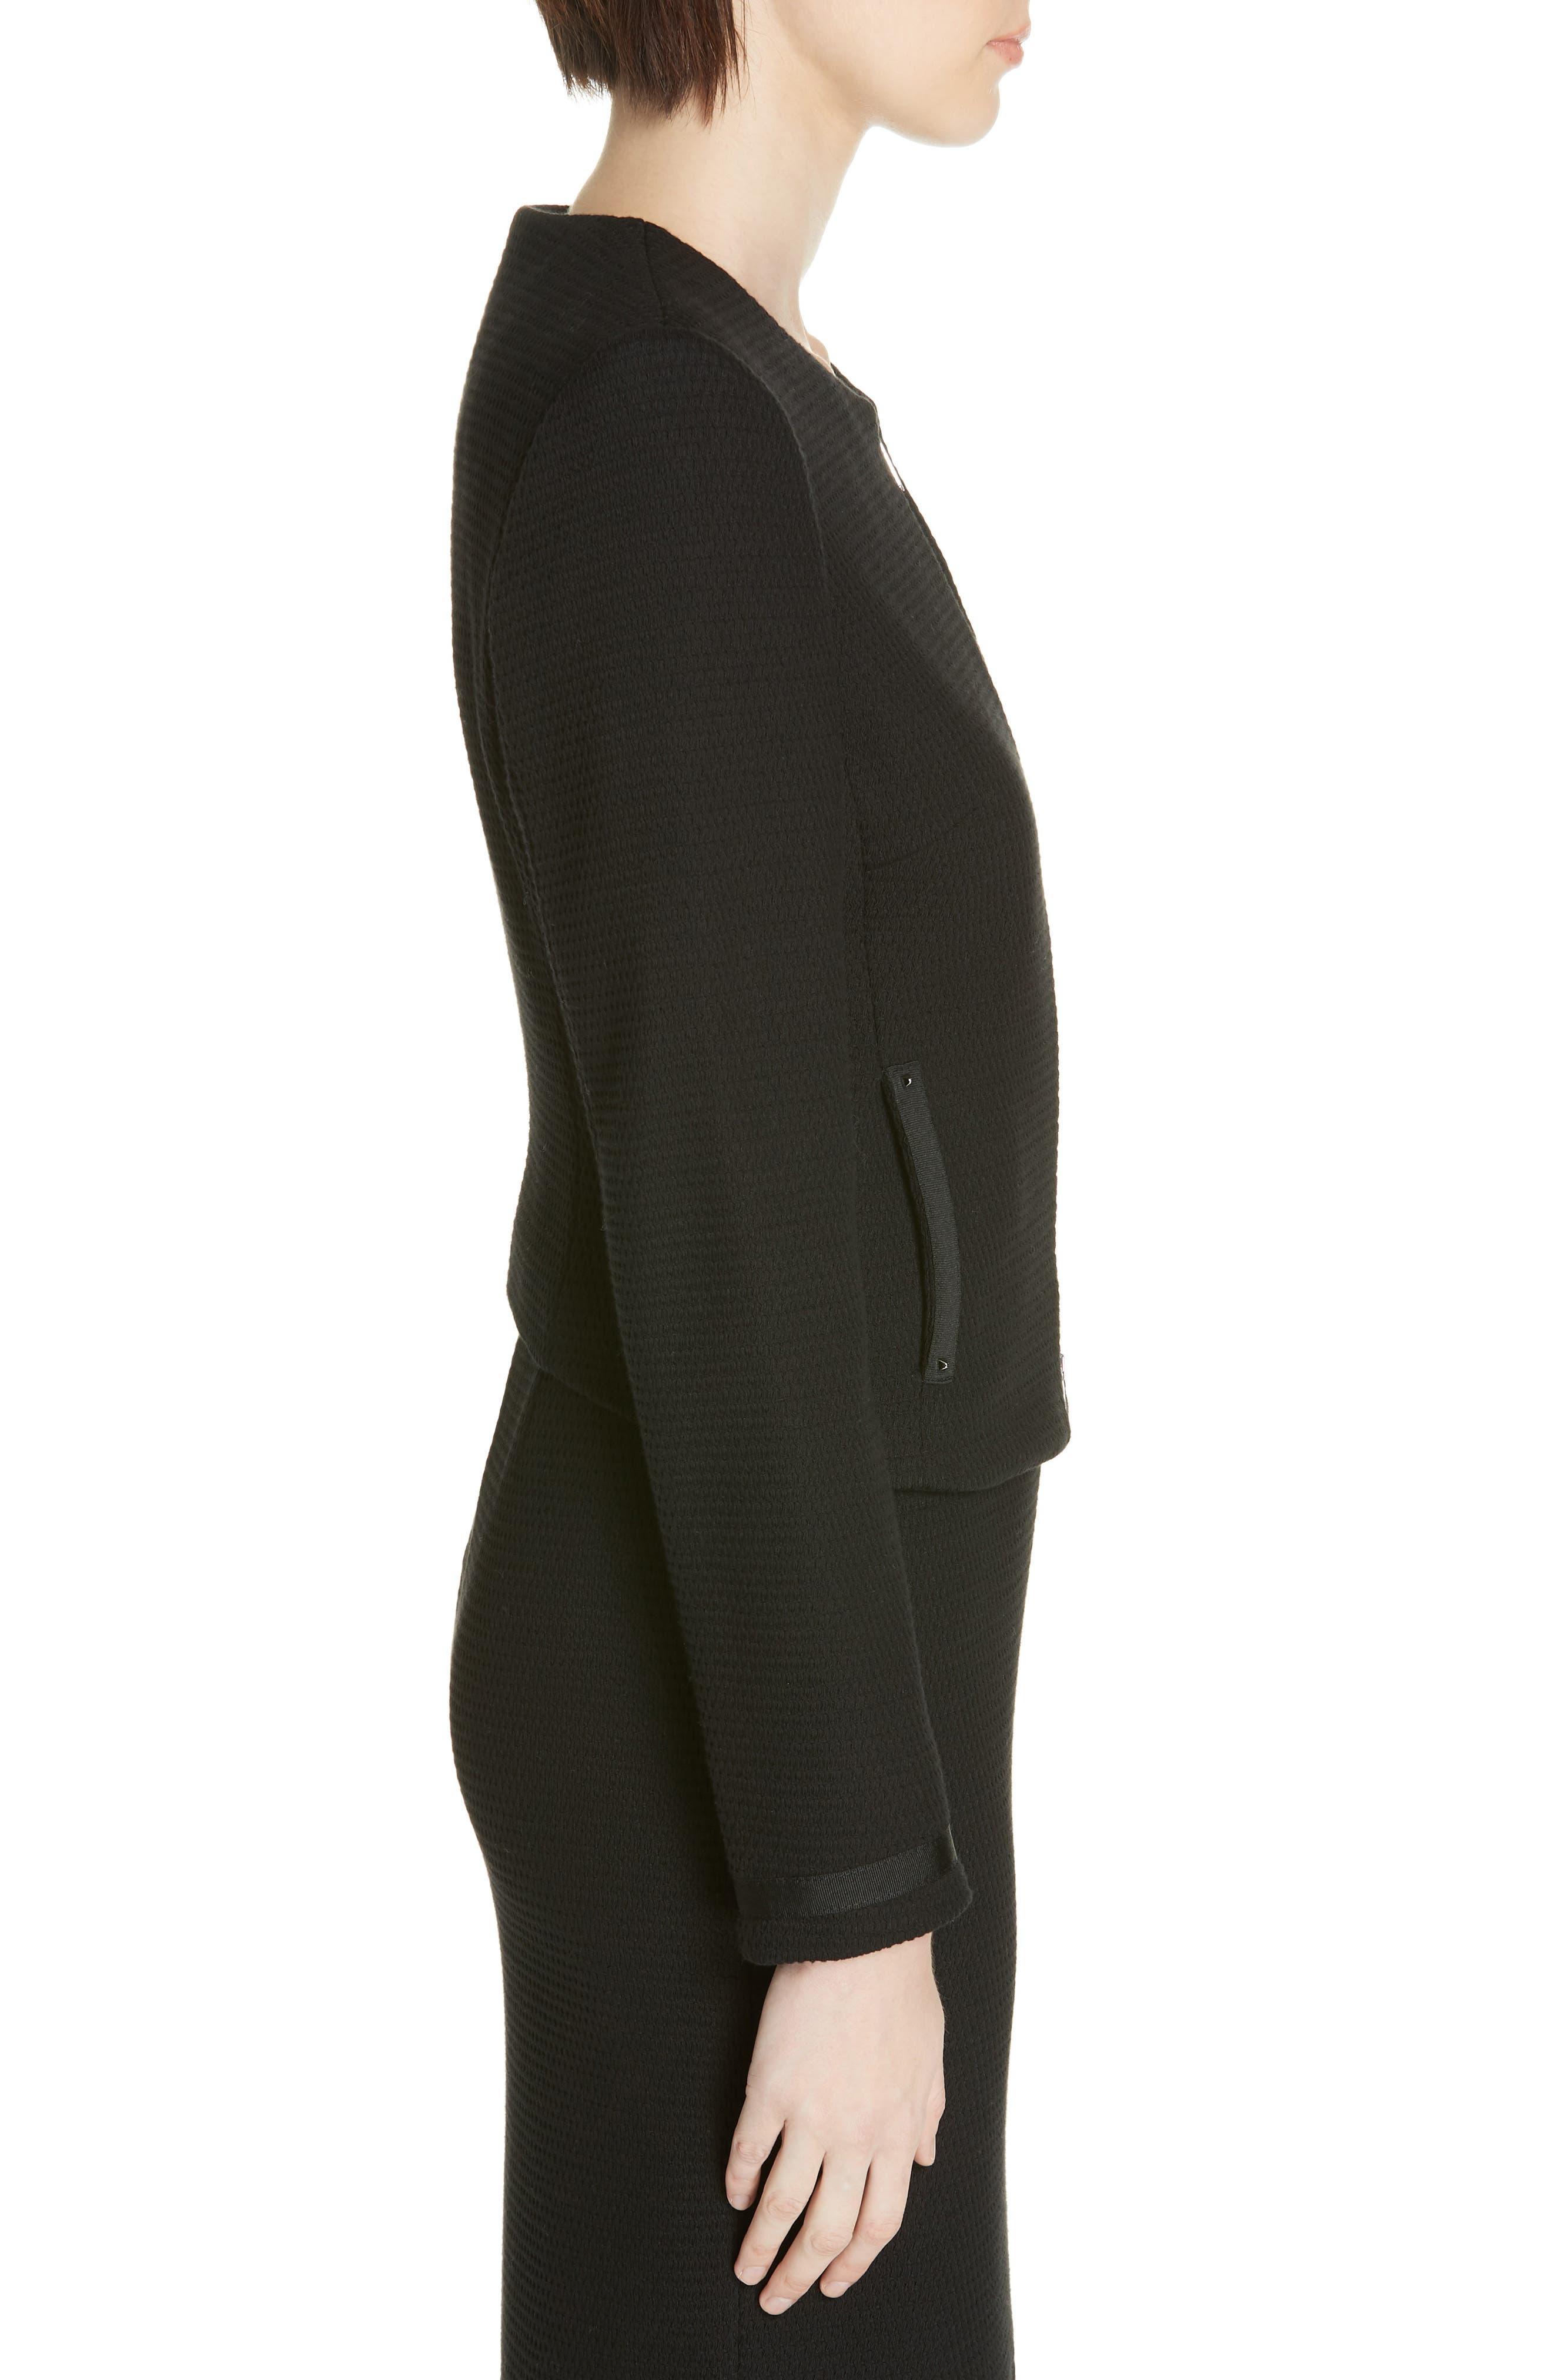 Kemio Textured Jersey Suit Jacket,                             Alternate thumbnail 3, color,                             BLACK